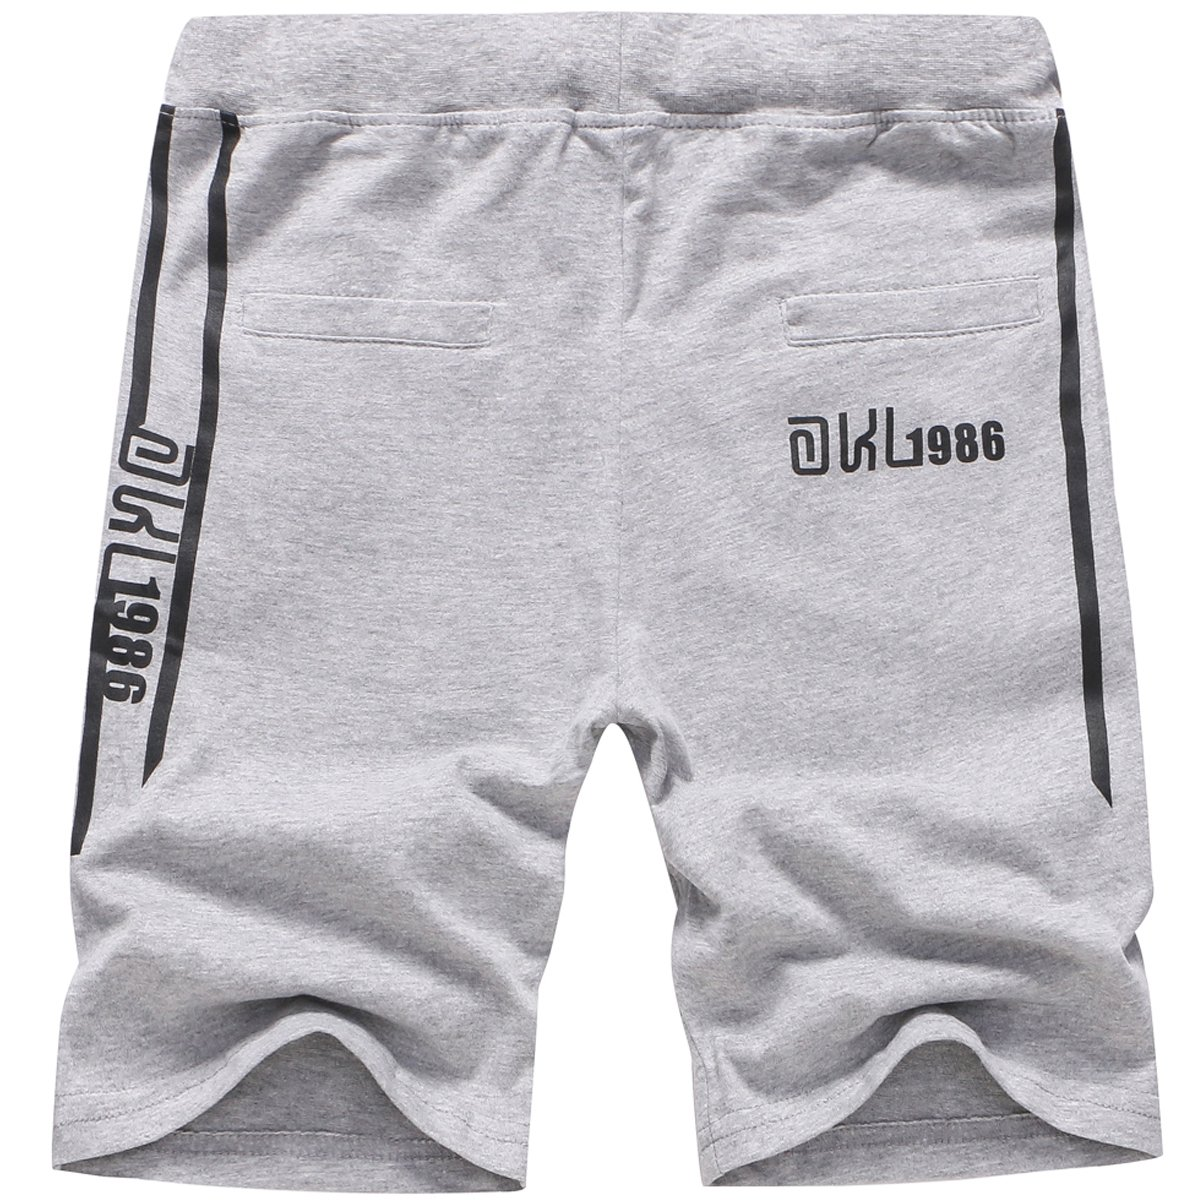 AOWKULAE Boys Cotton Pull on Shorts